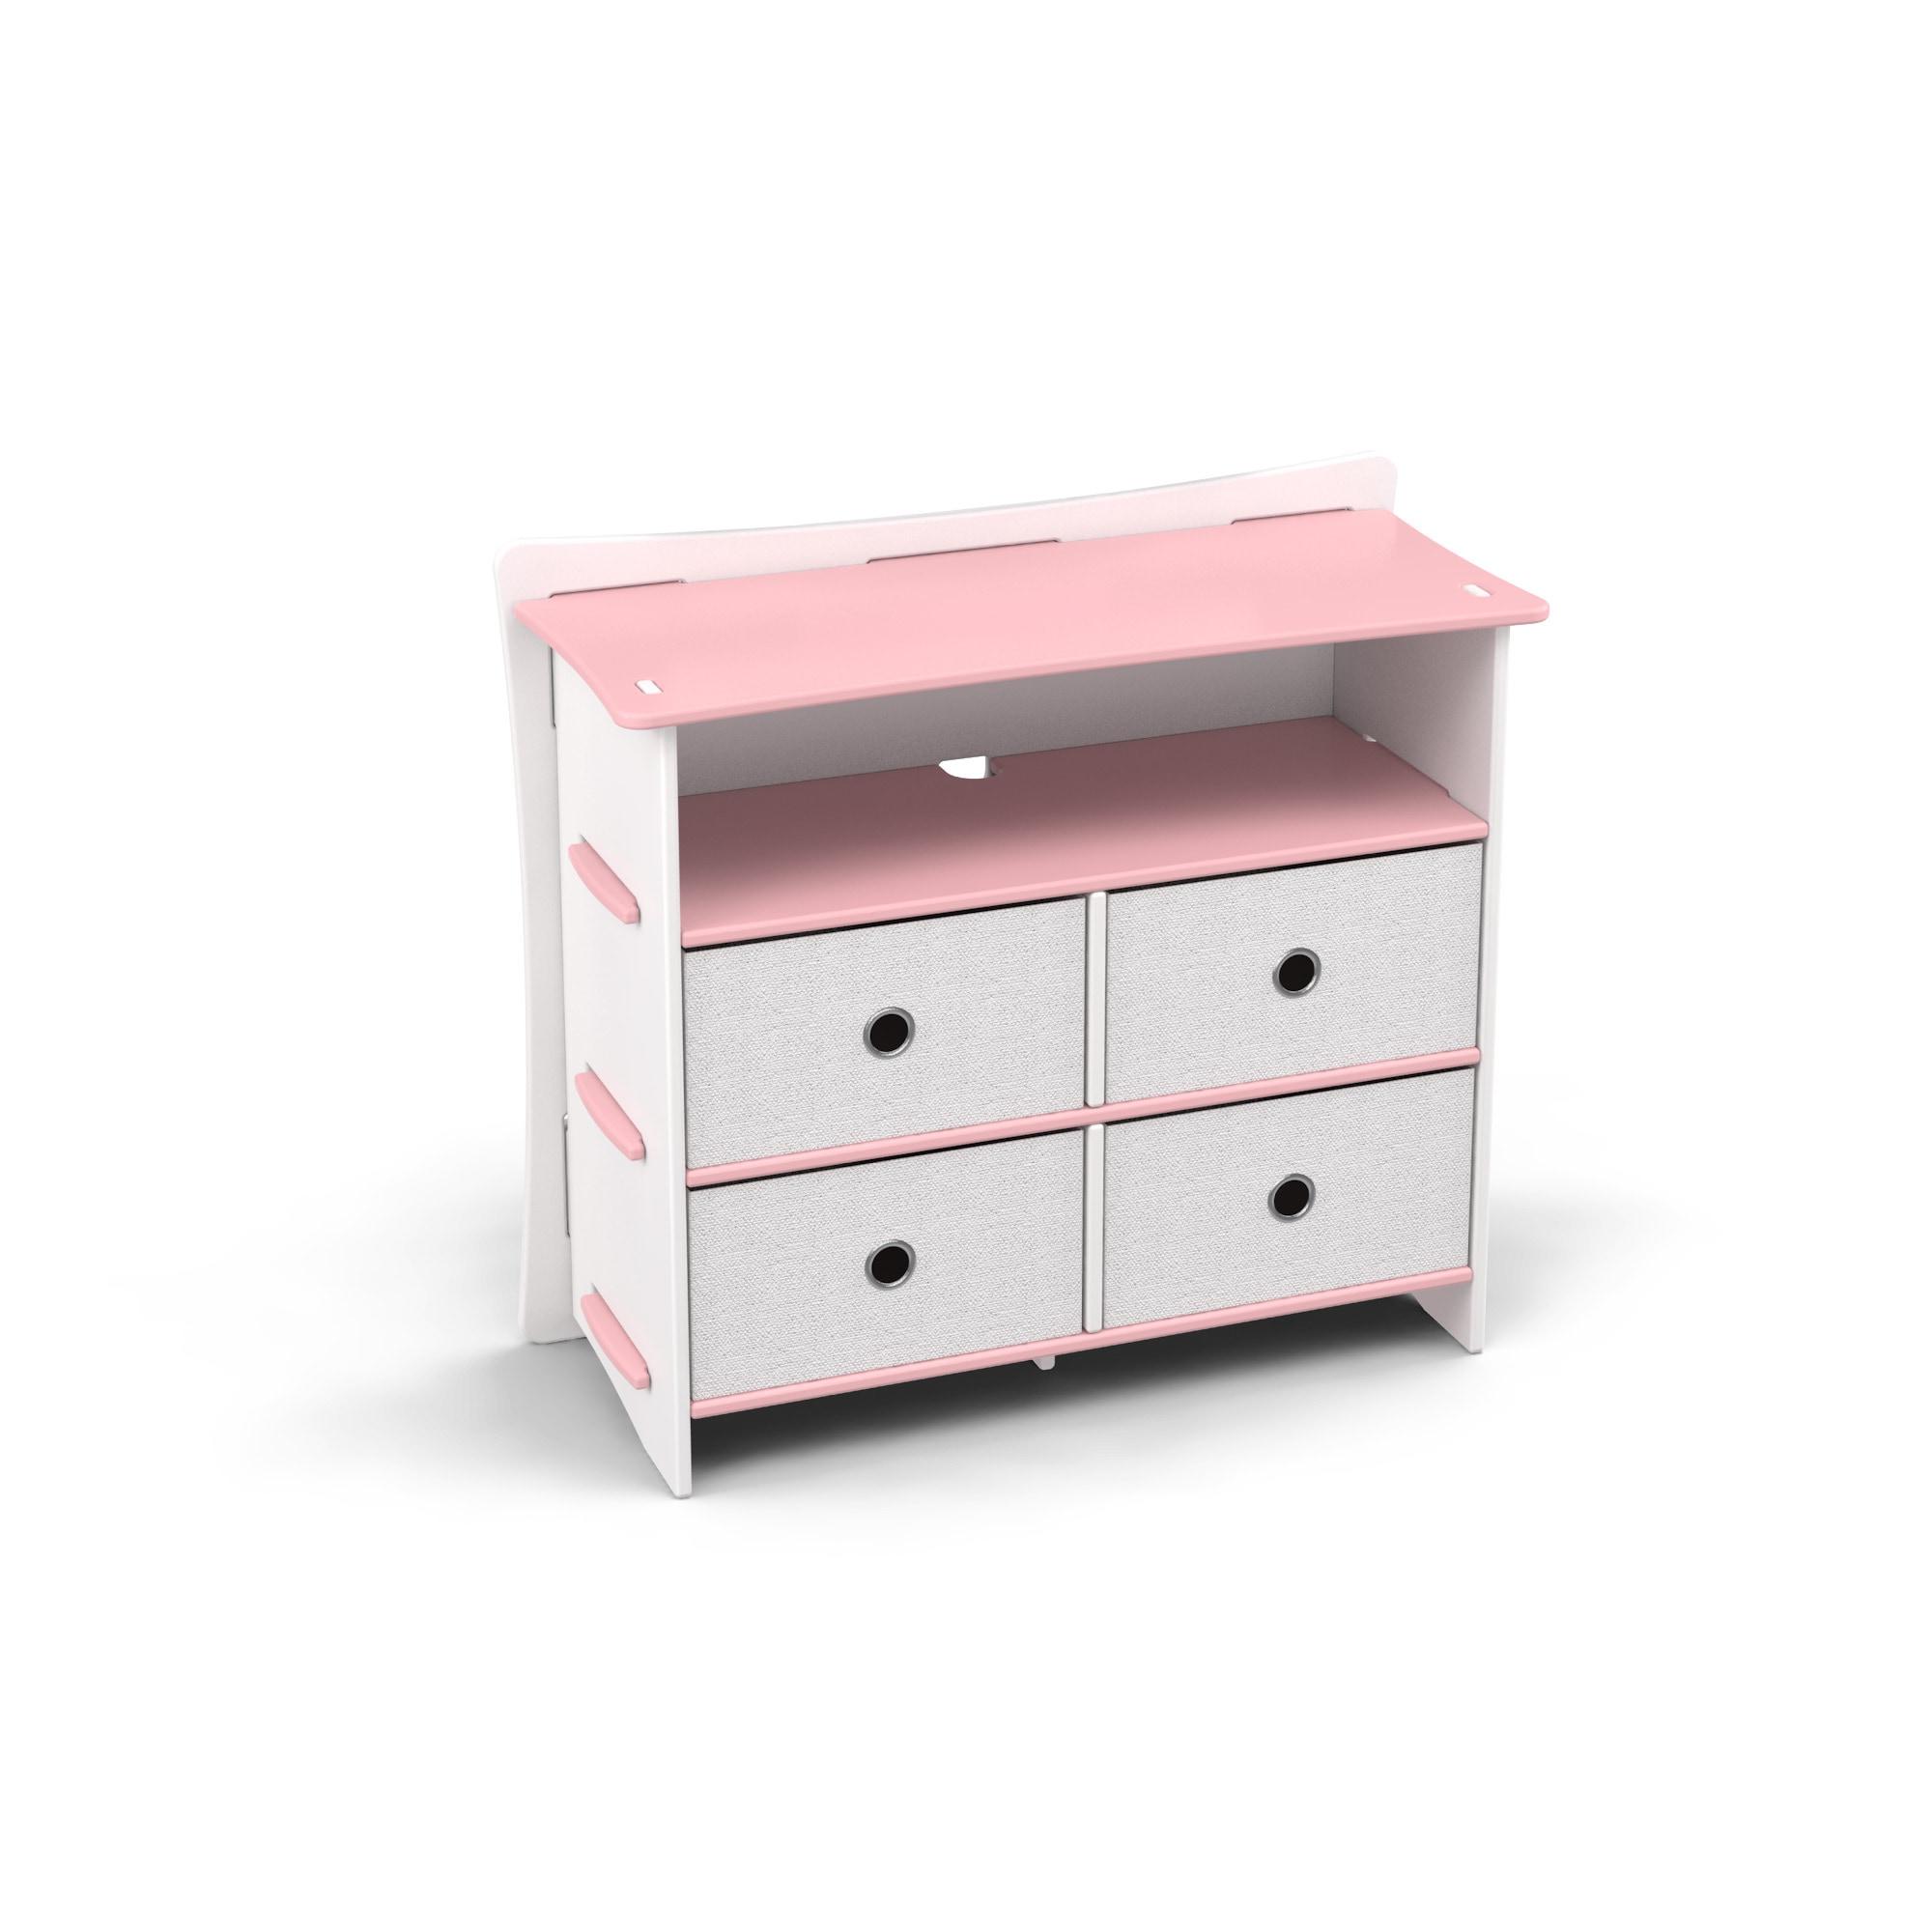 LEGARE Kids Furniture 4-drawer Pink and White Dresser (4-...